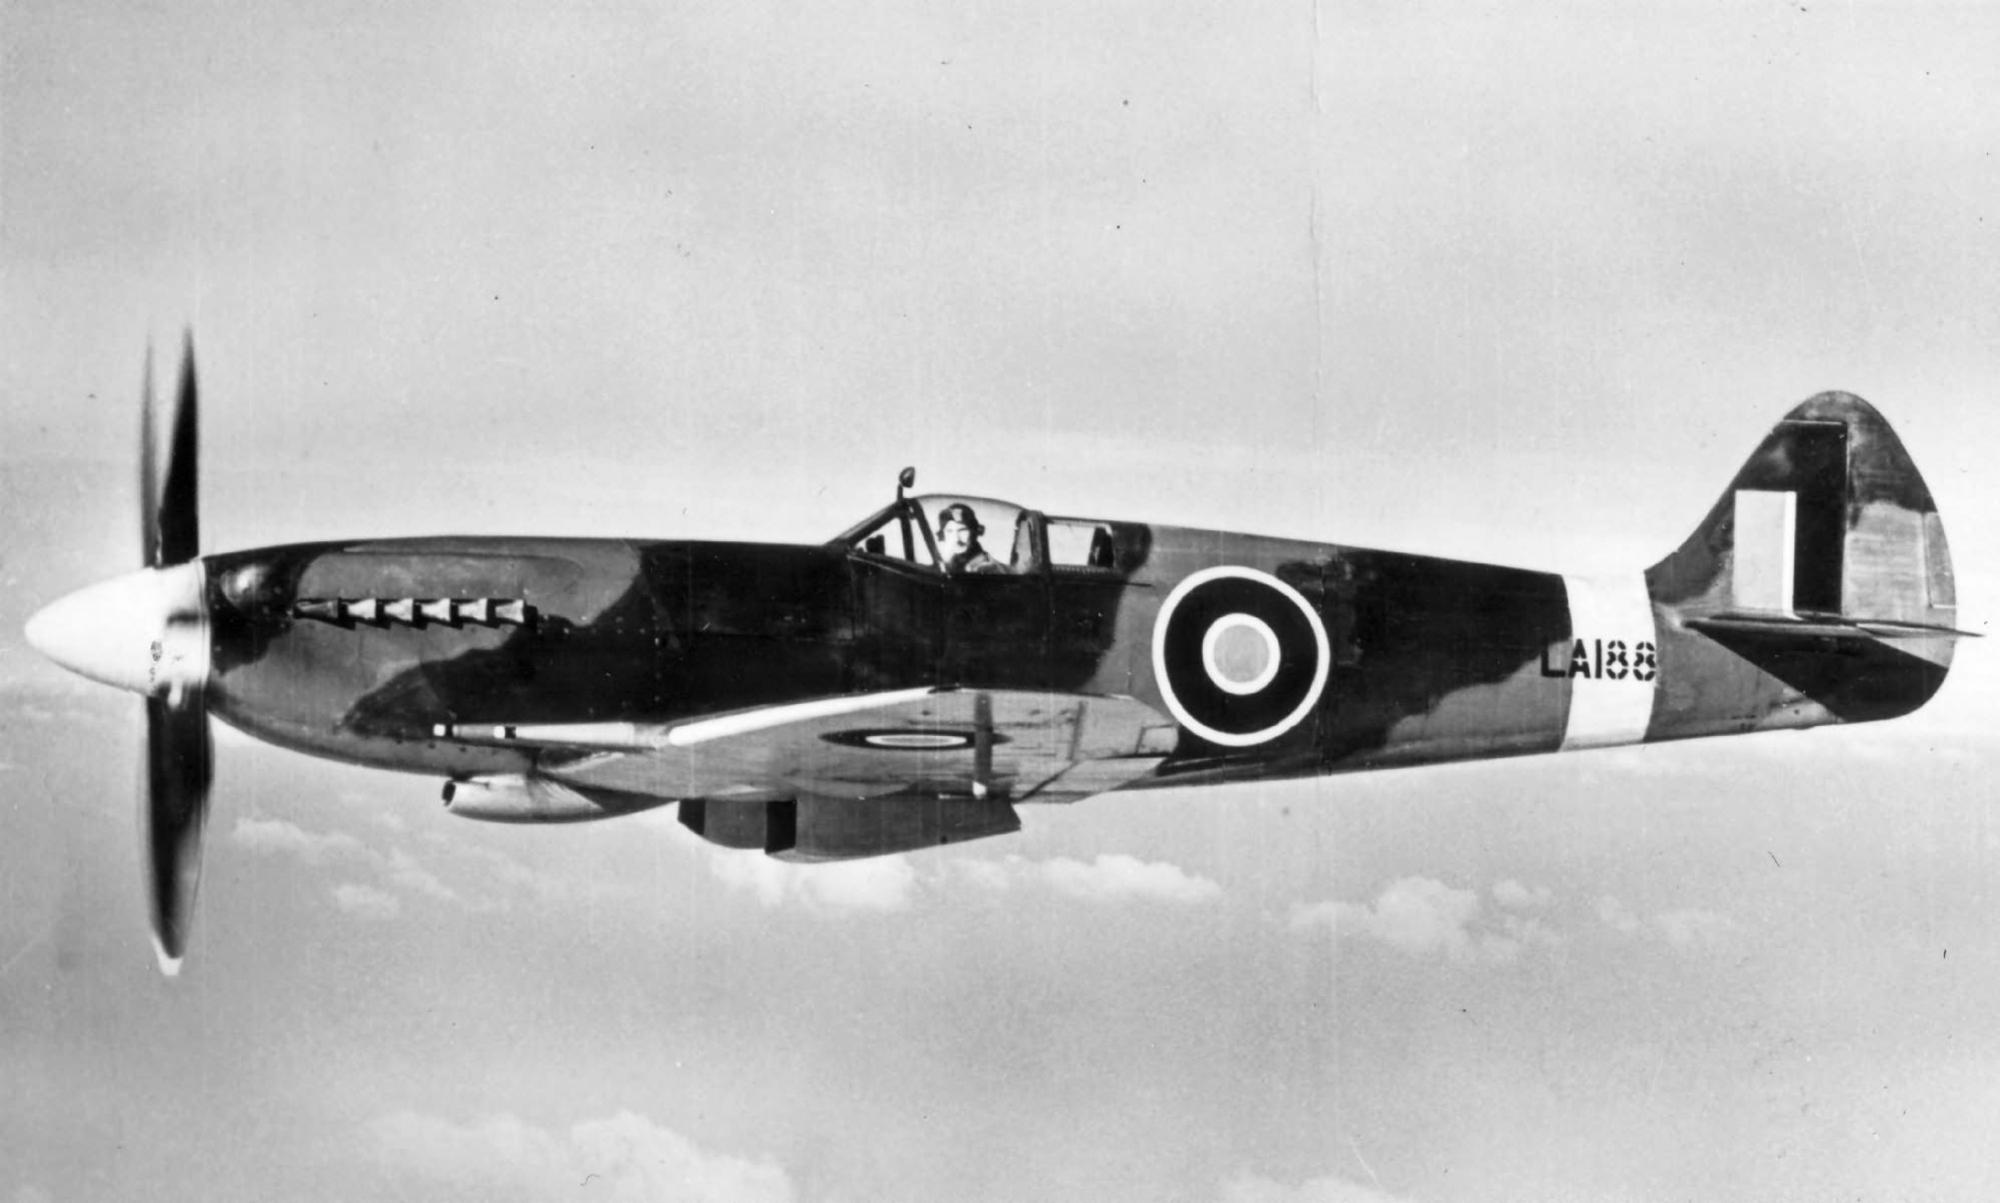 Spitfire 21 RAF LA188 over England web 01